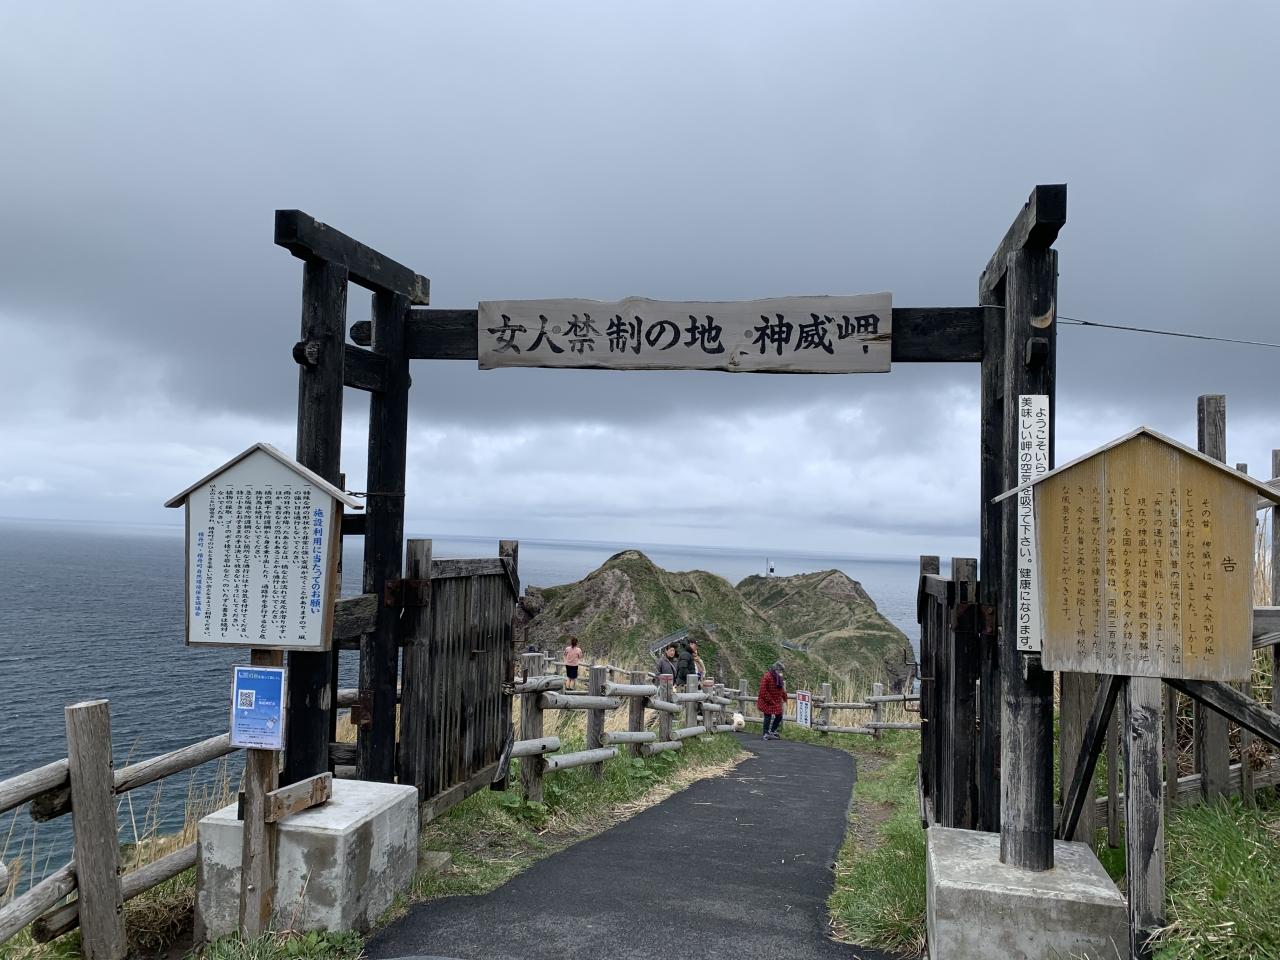 『201904-05GW-06_積丹半島ドライブと小樽 Drive in Shakotan and Otaru ...